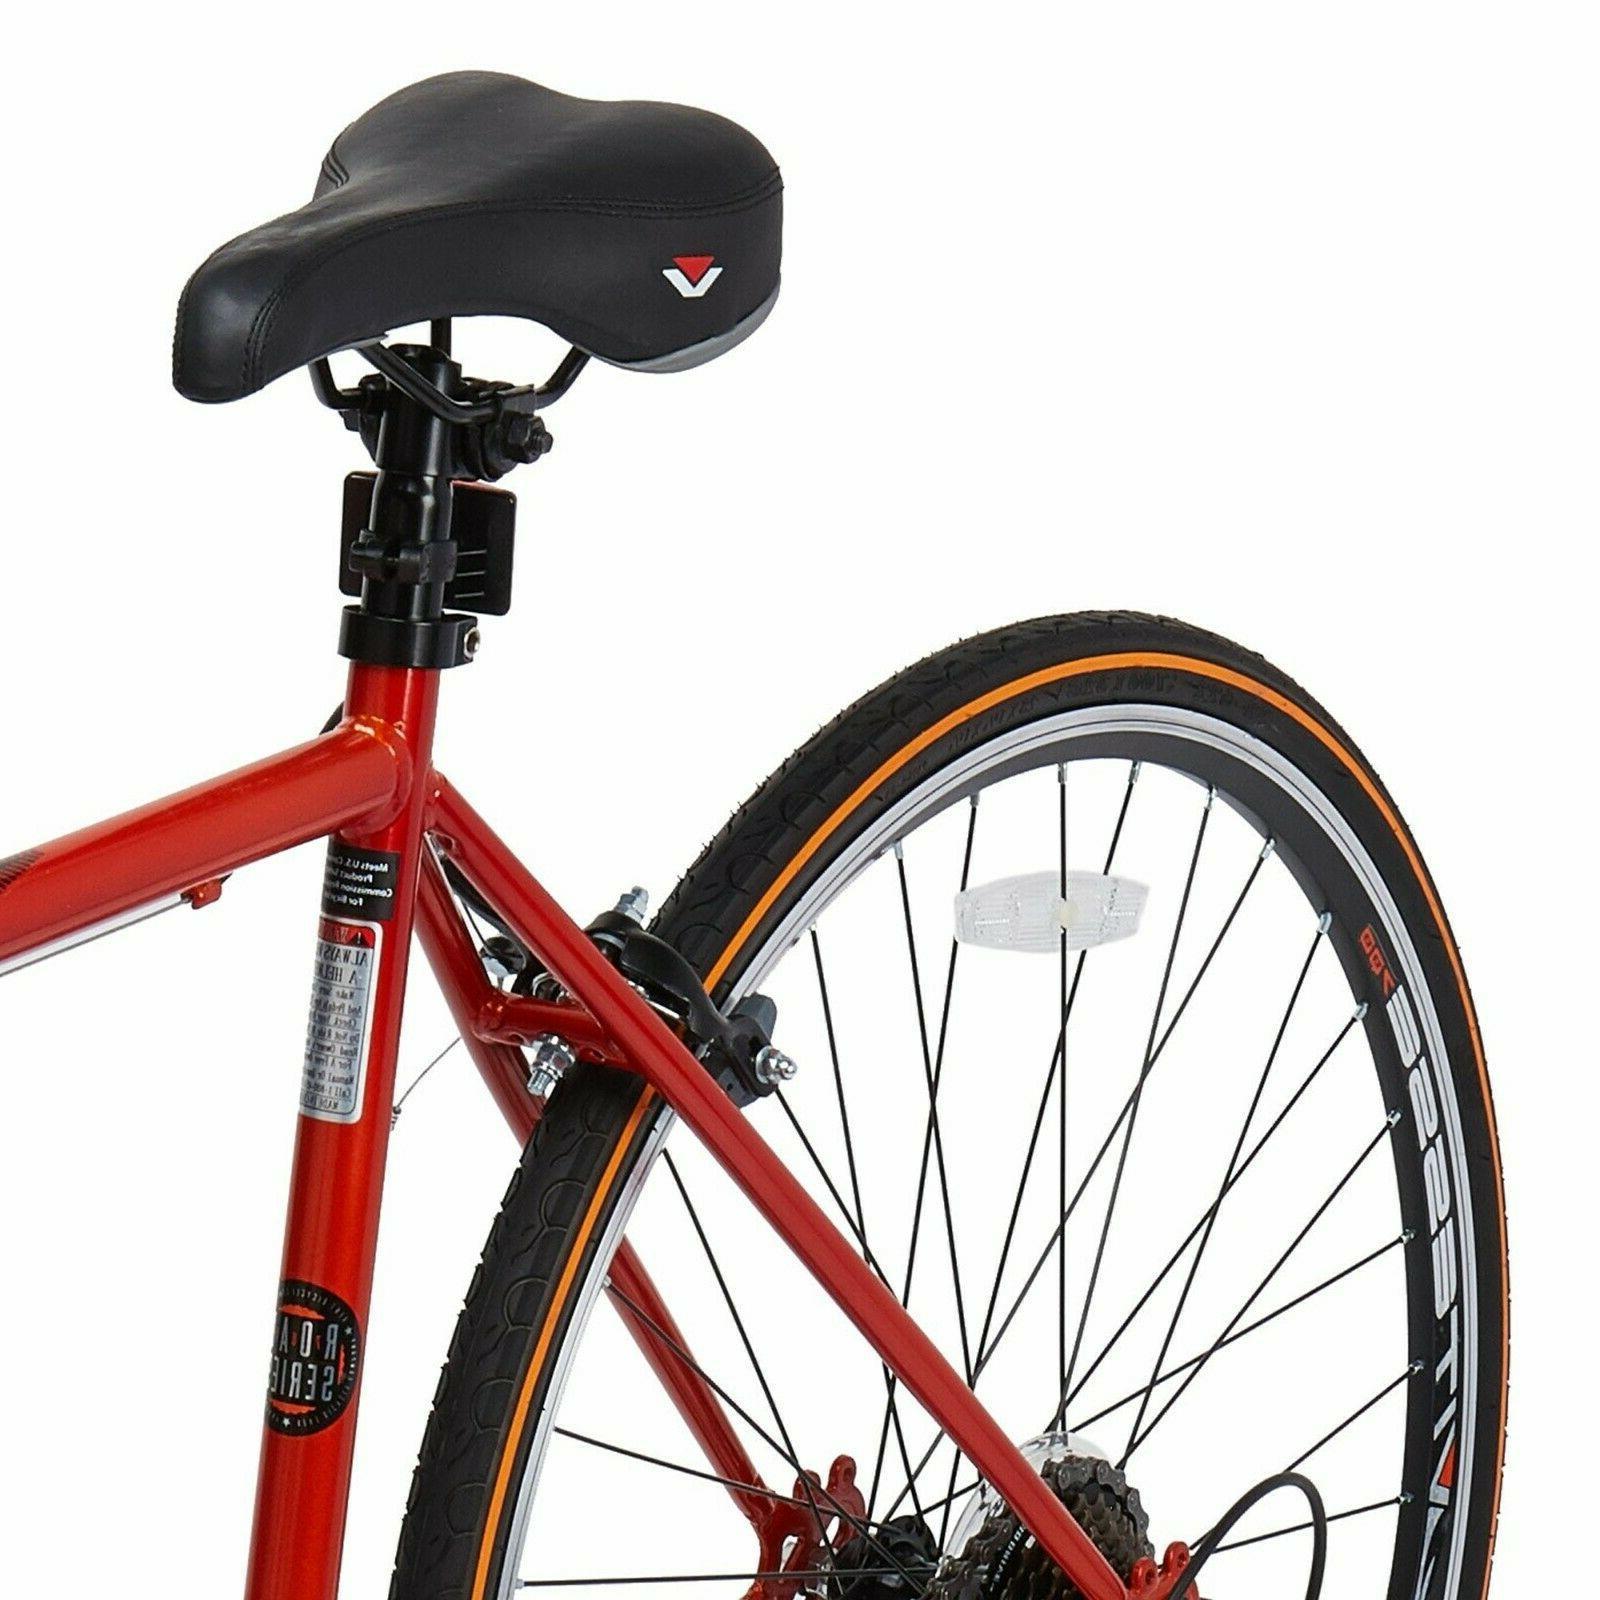 Kent GZR700 Road Bike in